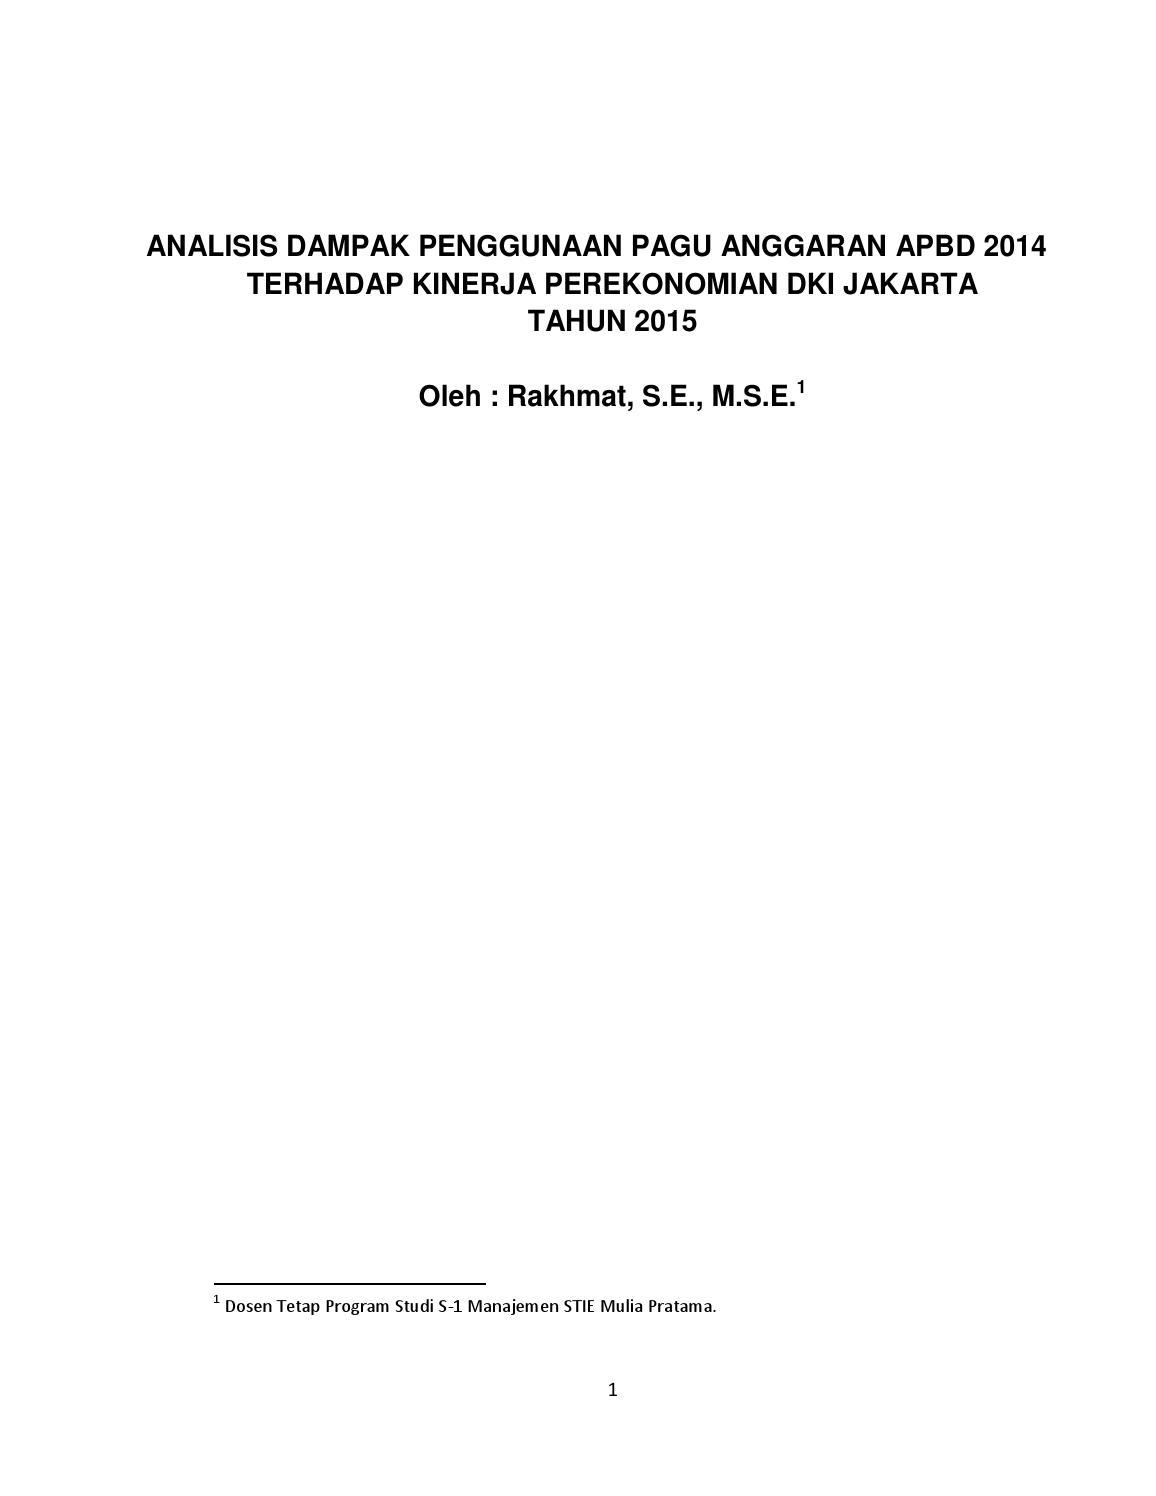 Analisis Dampak Penggunaan Pagu Anggaran Apbn 2014 Terhadap Teori Ekonomi Makro Pratama Perekomian Dki Jakarta By Stie Mulia Bekasi Issuu